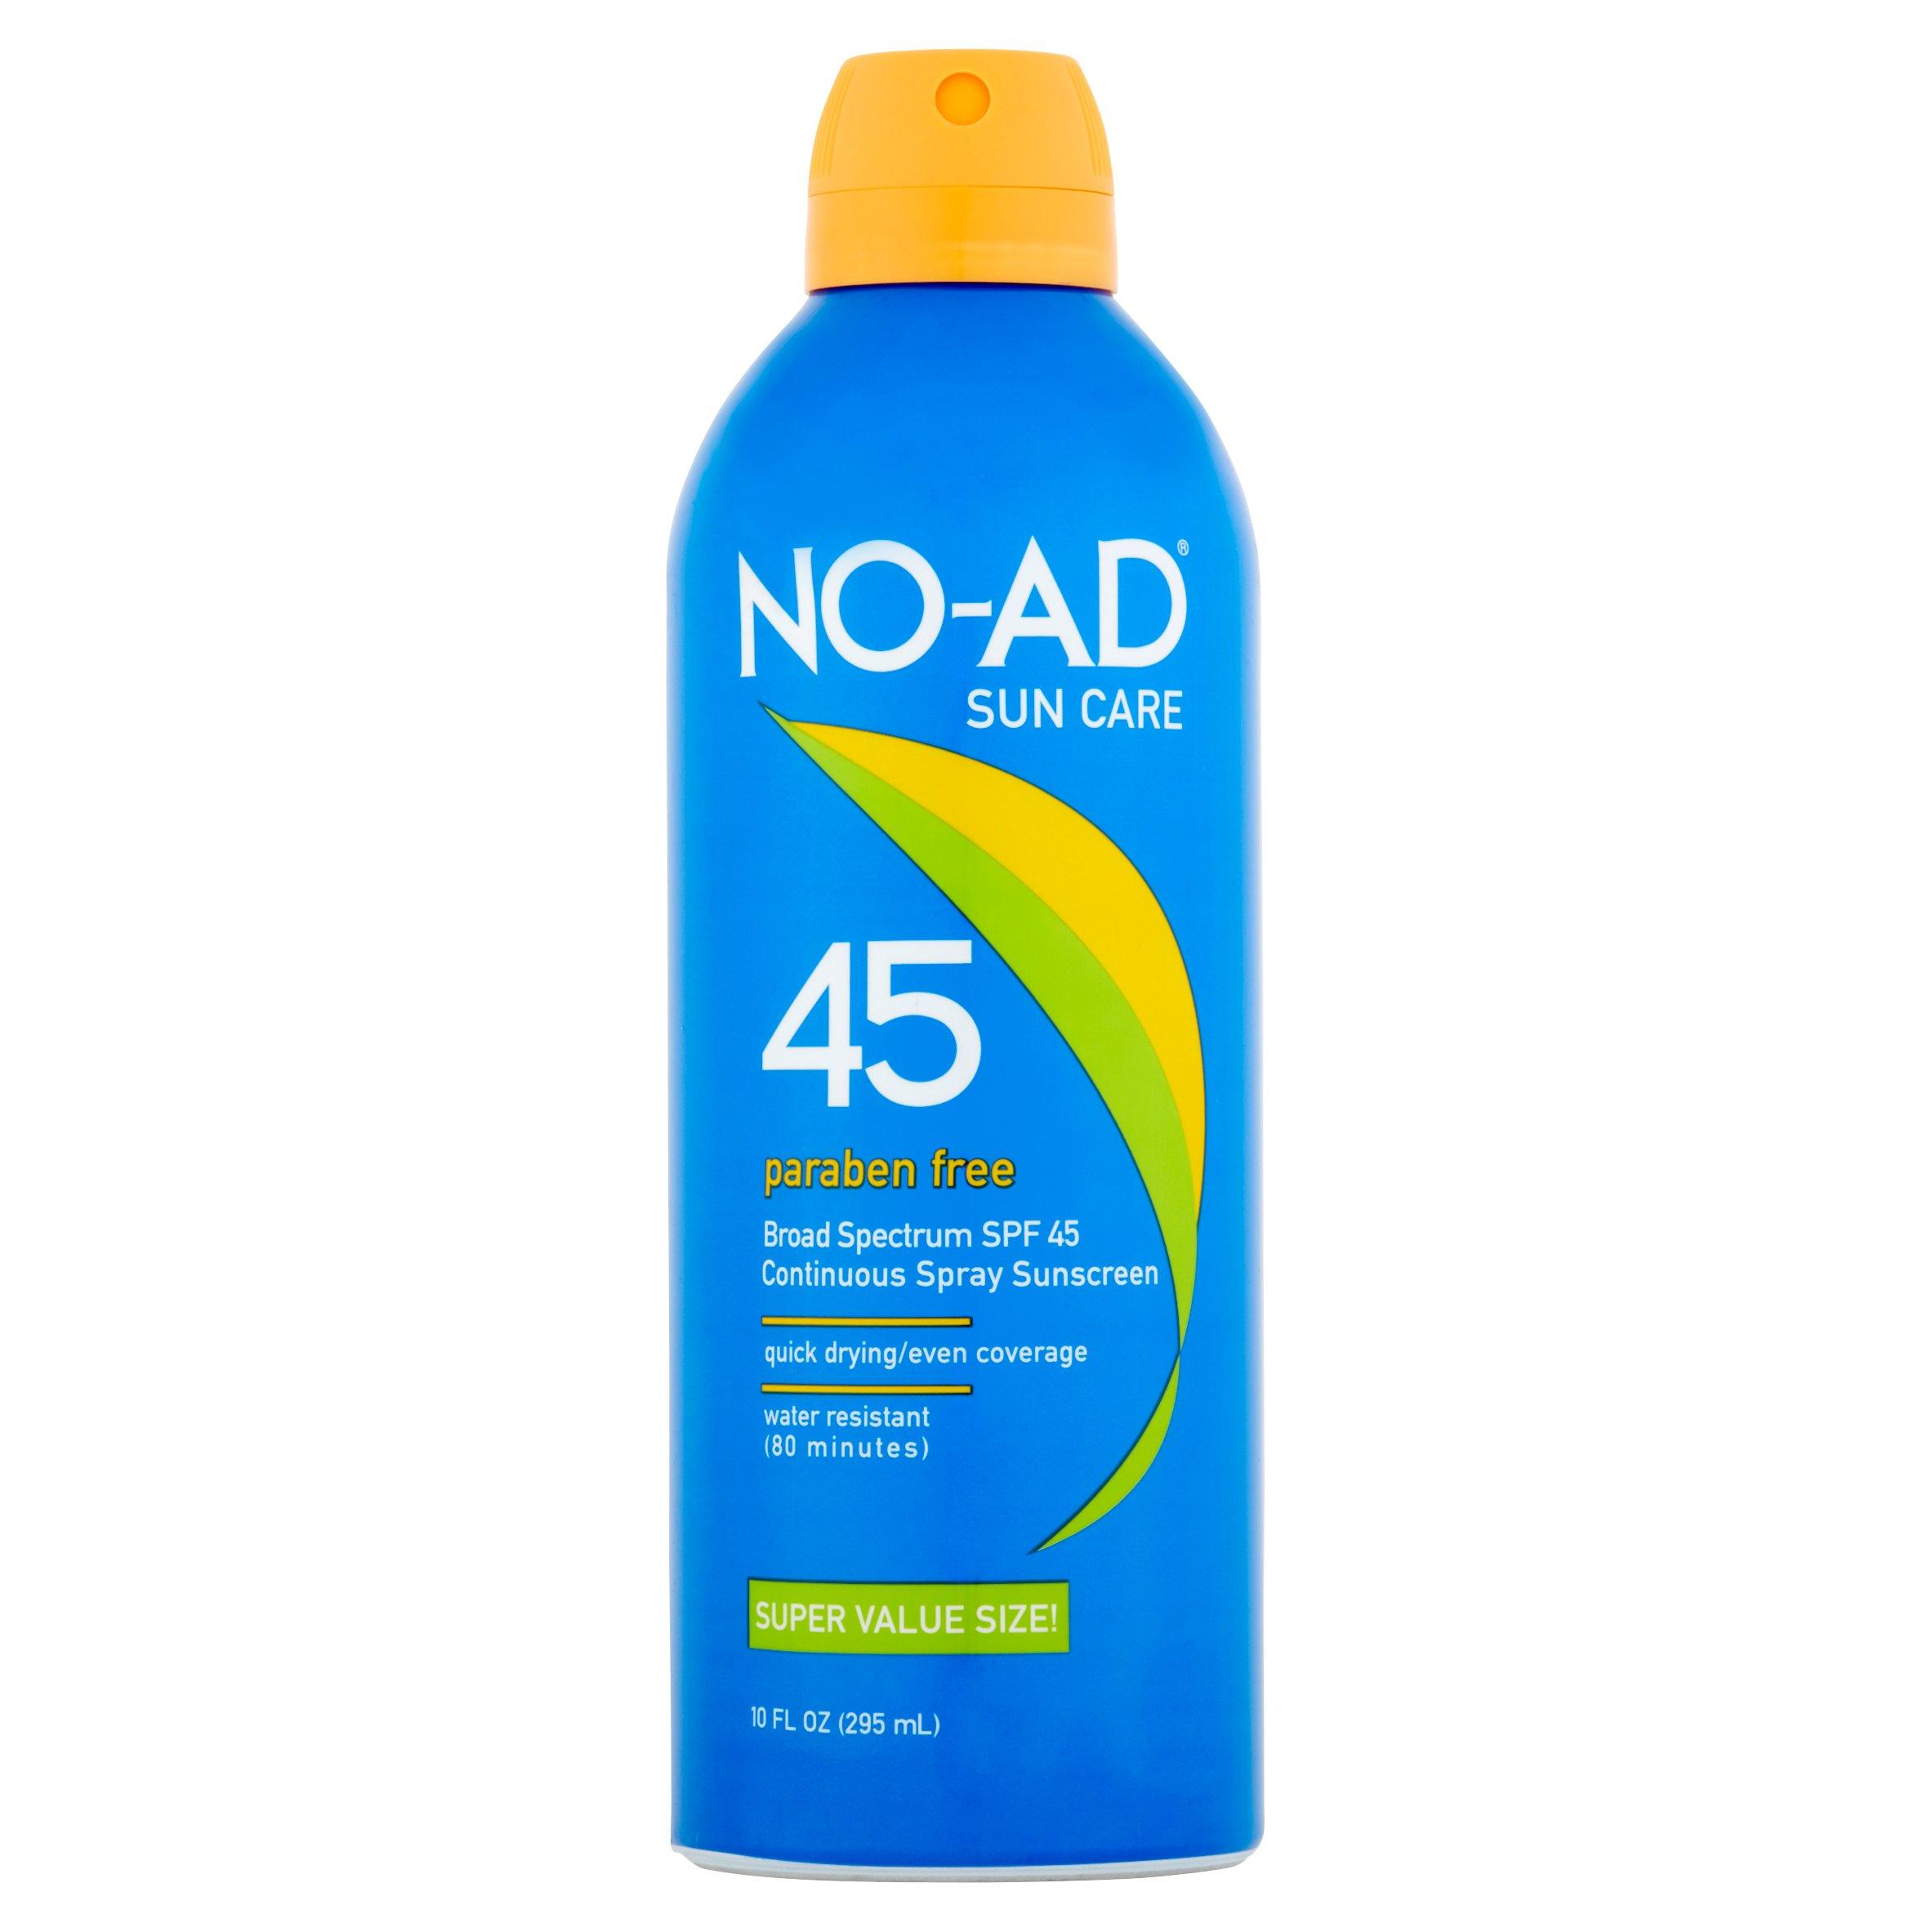 NO-AD Sun Care 21501-500-DM06